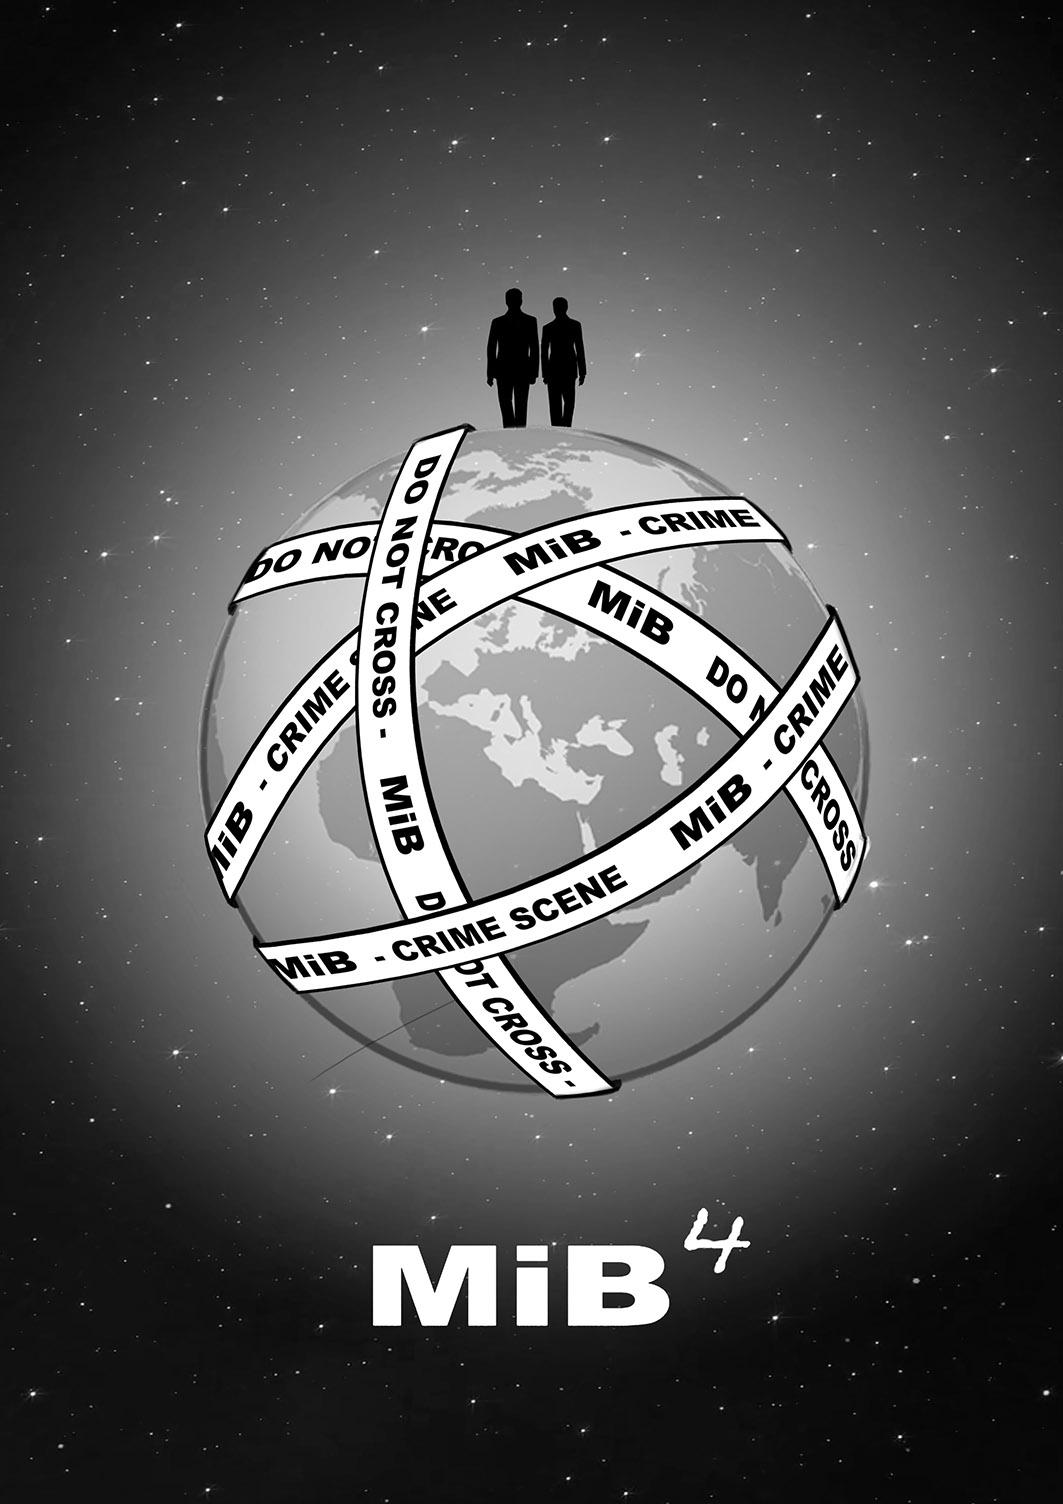 mib 7